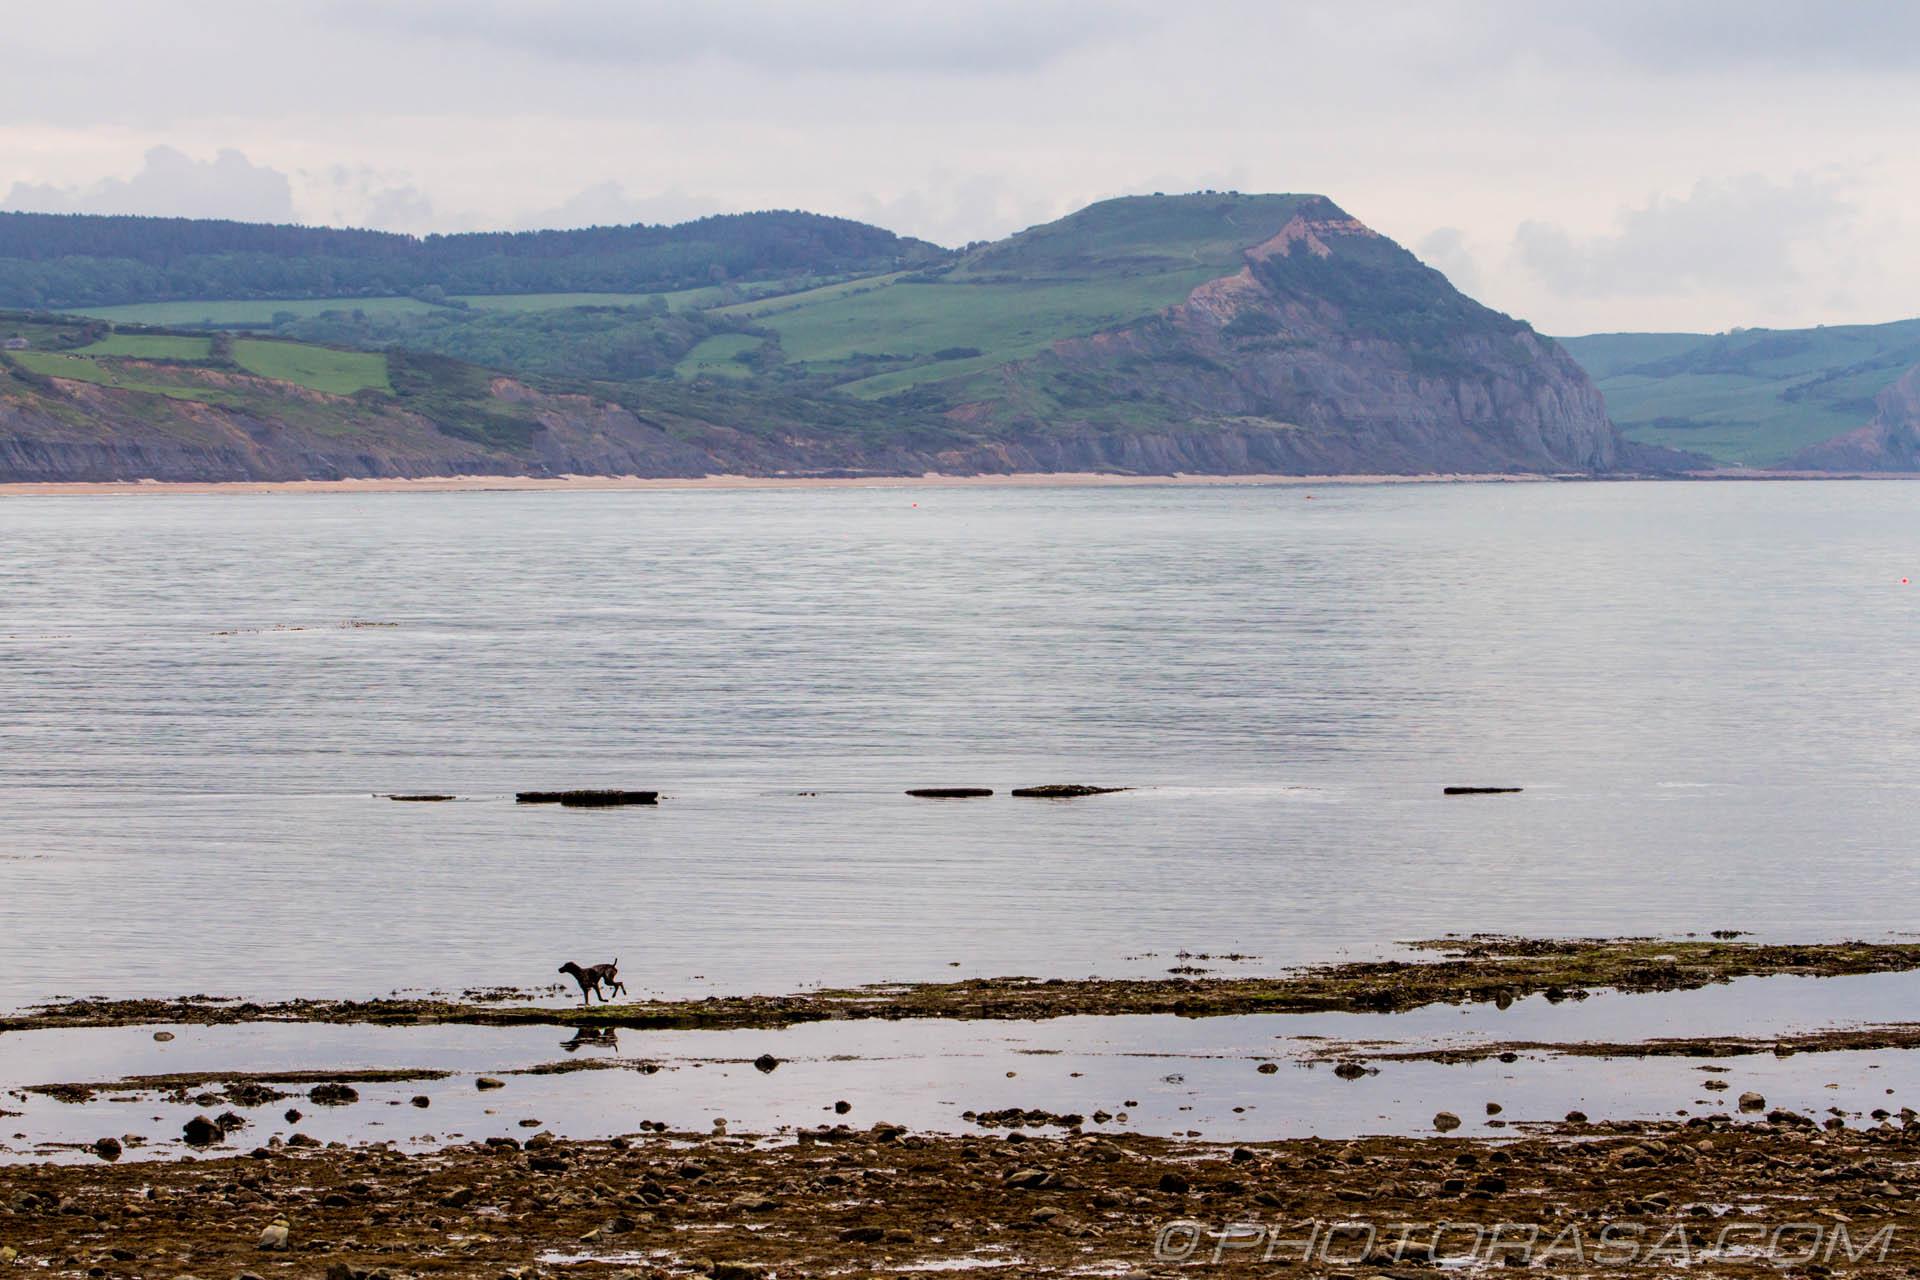 https://photorasa.com/walking-dog-jurassic-coast/dog-and-jurassic-coast/